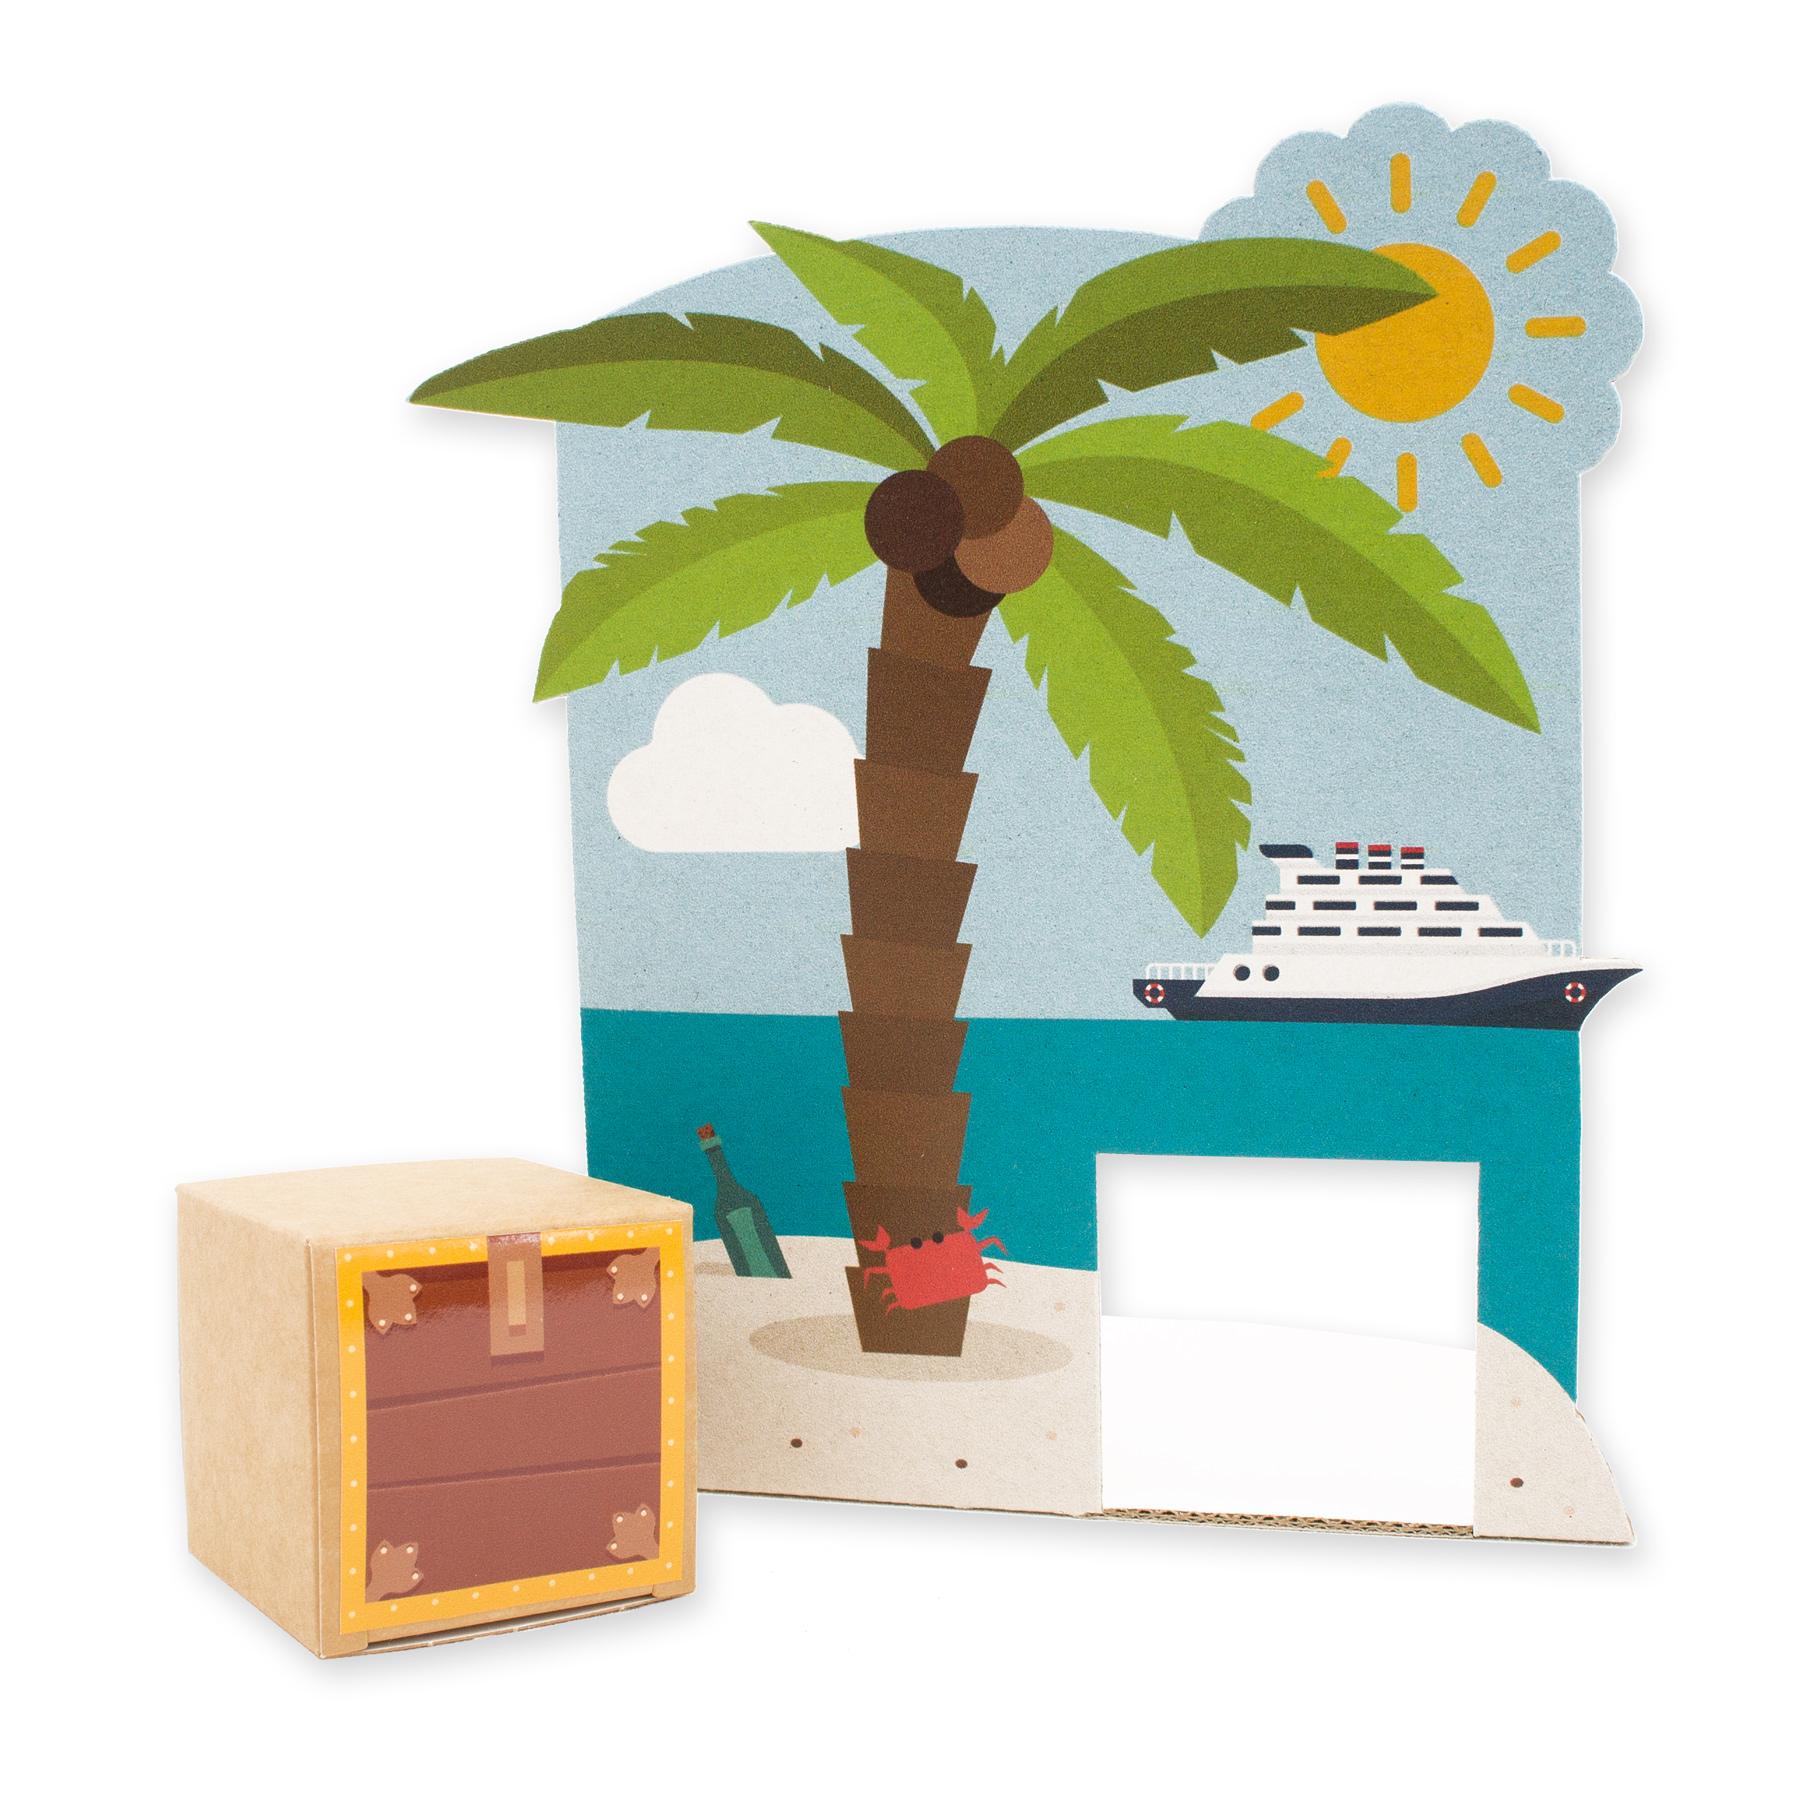 itenga Geldgeschenkverpackung Insel mit Schatztruhe